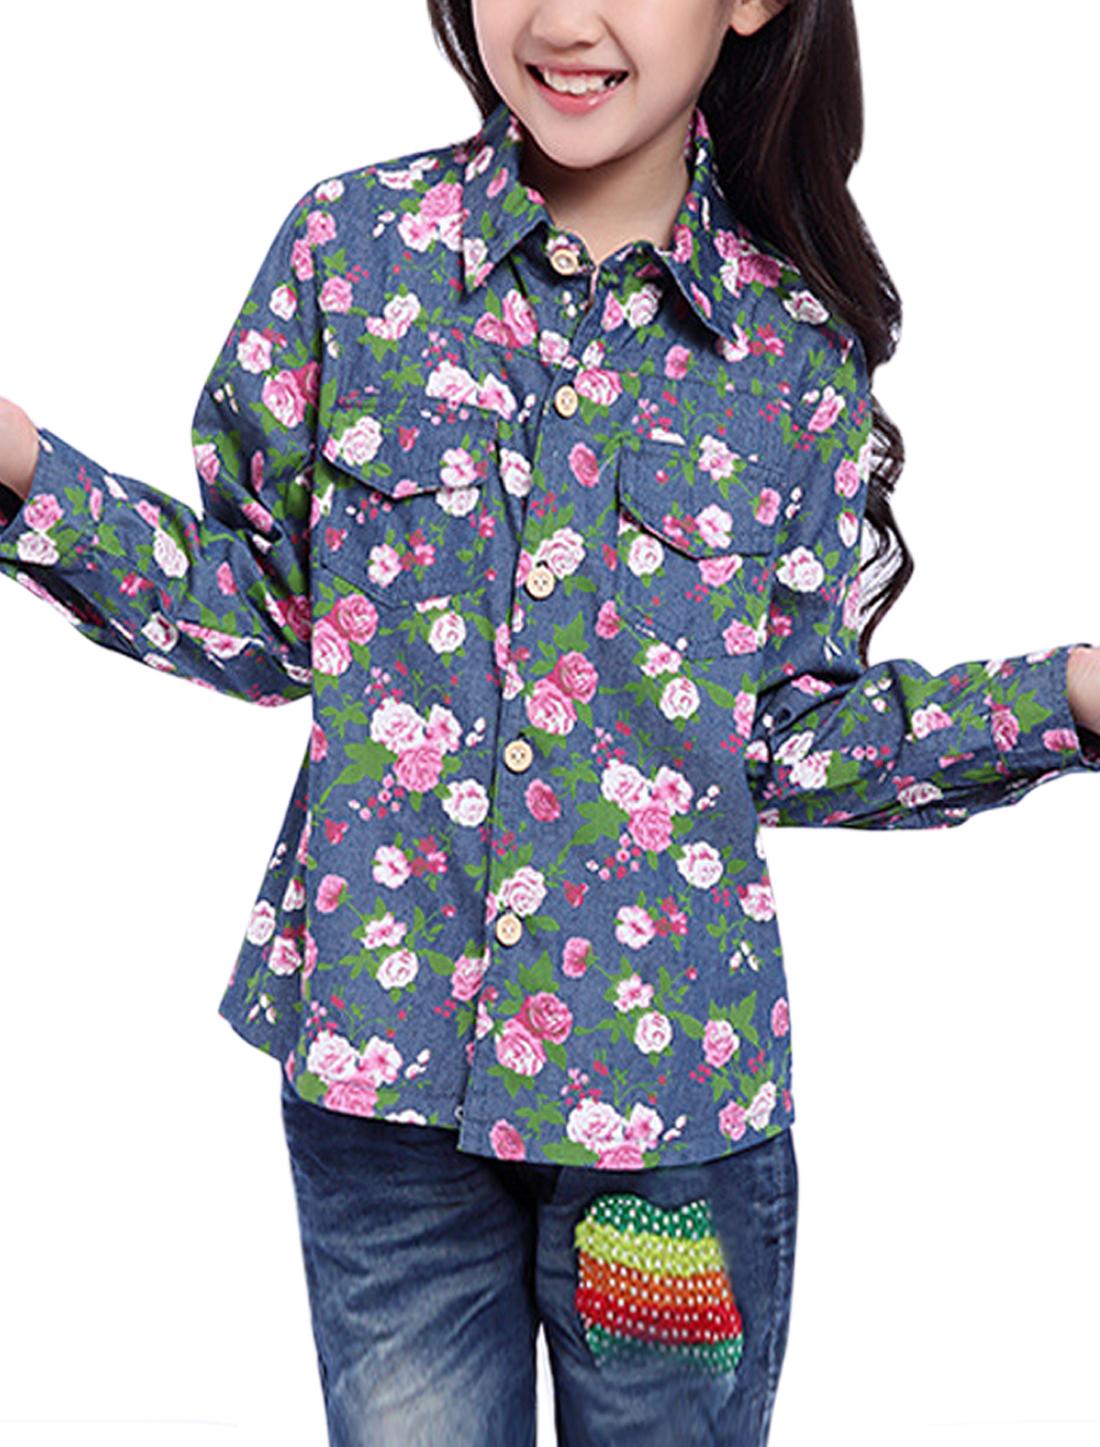 Girls Floral Prints Flap Chest Pockets Front Denim Shirt Blue 10